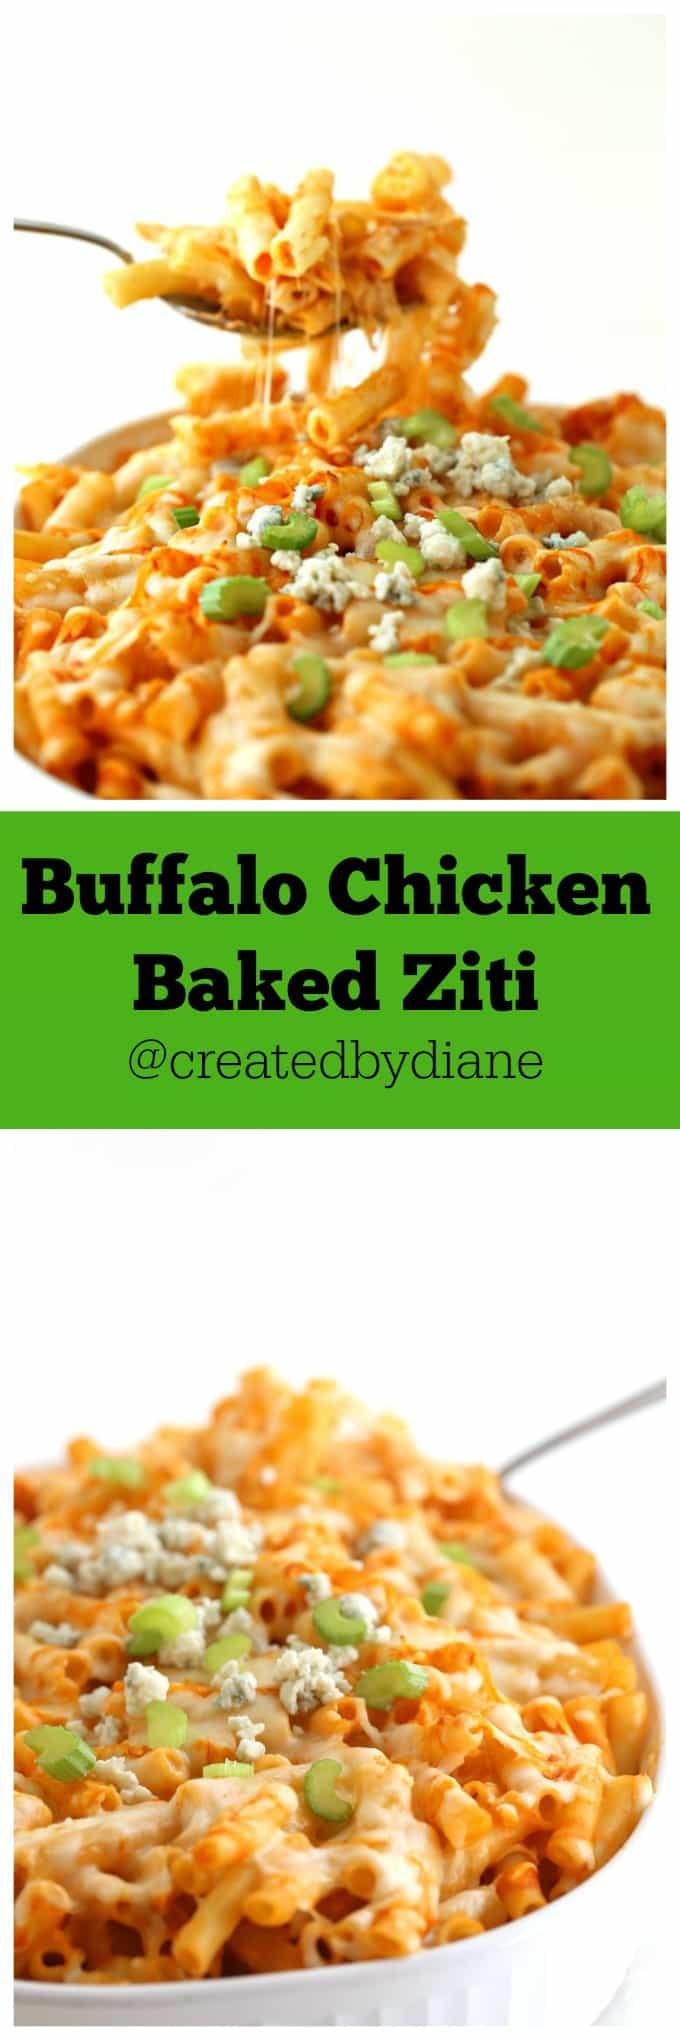 Buffalo Chicken Baked Ziti @createdbydiane